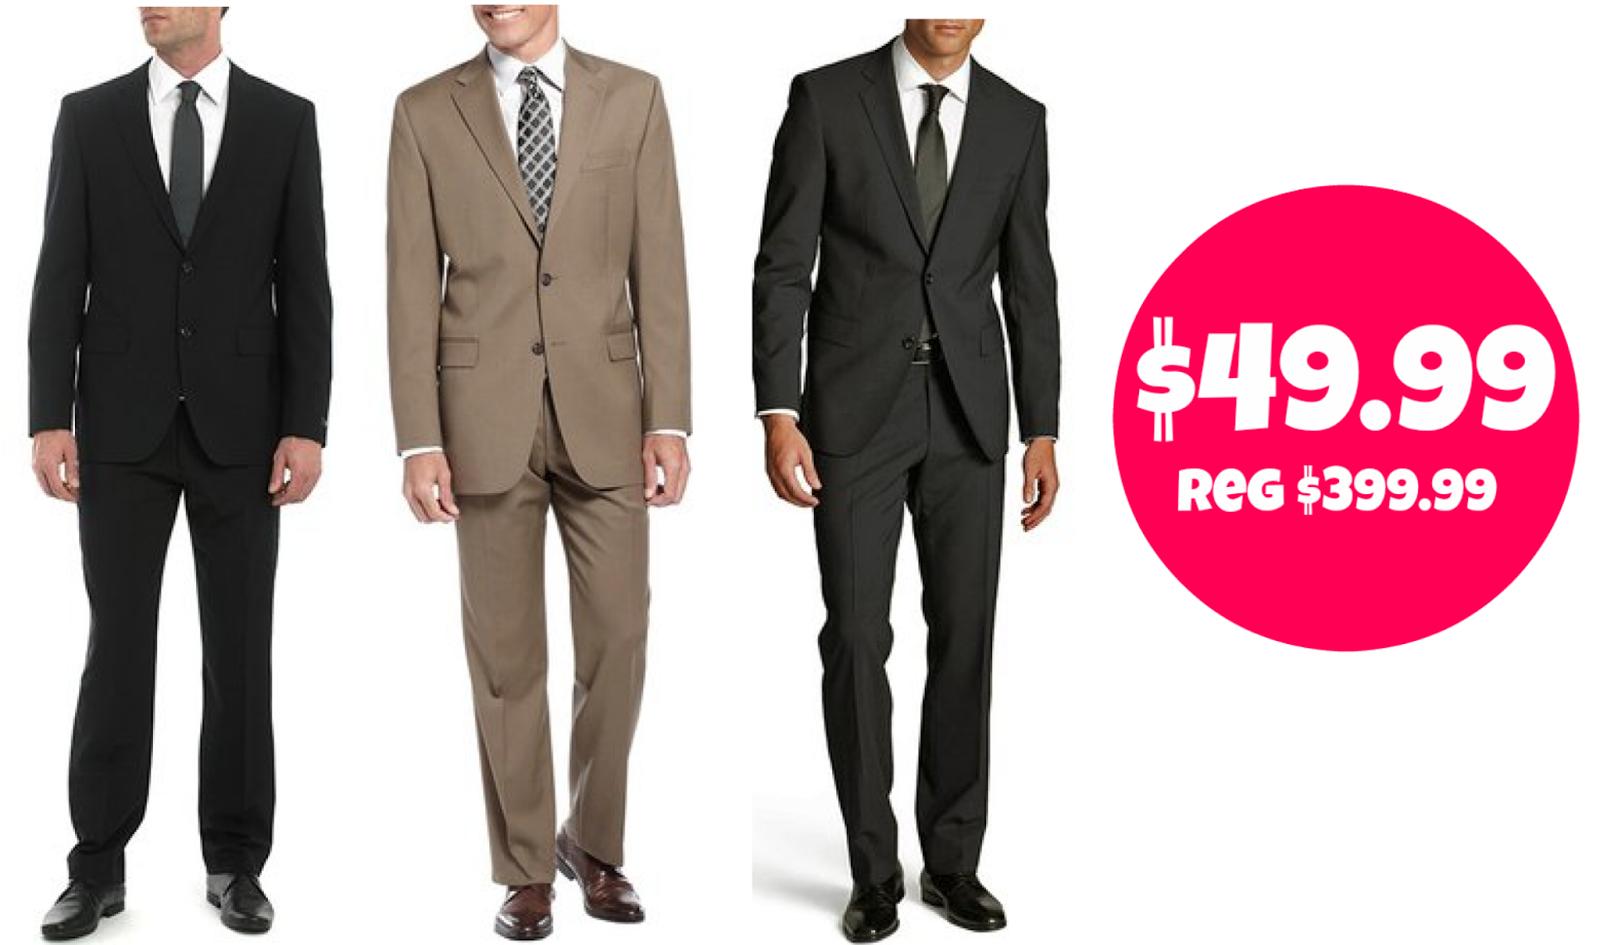 http://www.thebinderladies.com/2015/02/tanga-mens-classic-fit-suits-4999-6.html#.VNkaM4fduyM